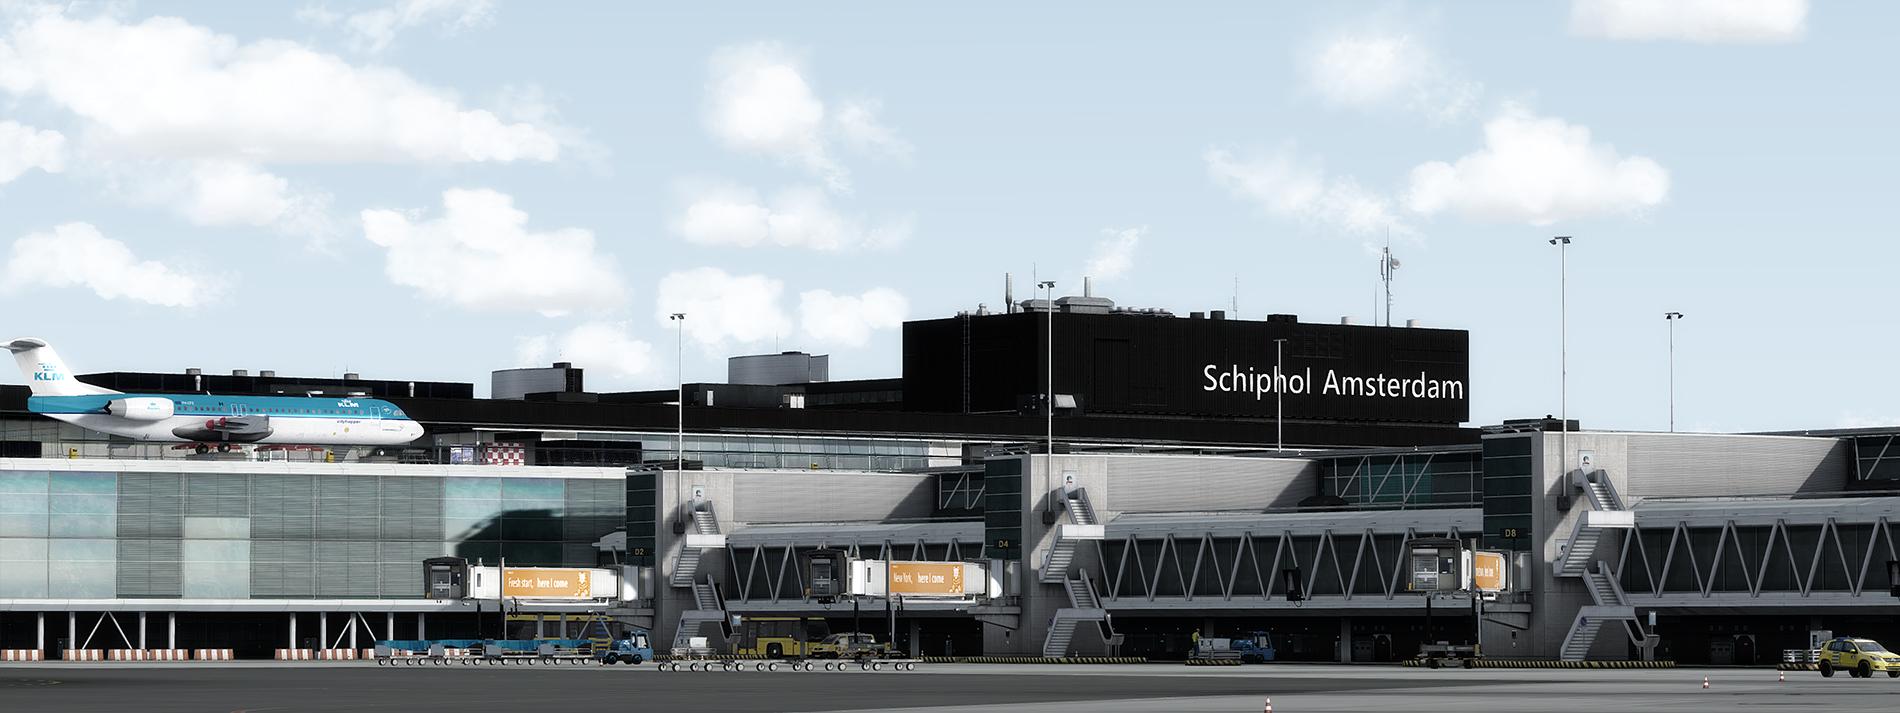 FlyTampa Amsterdam